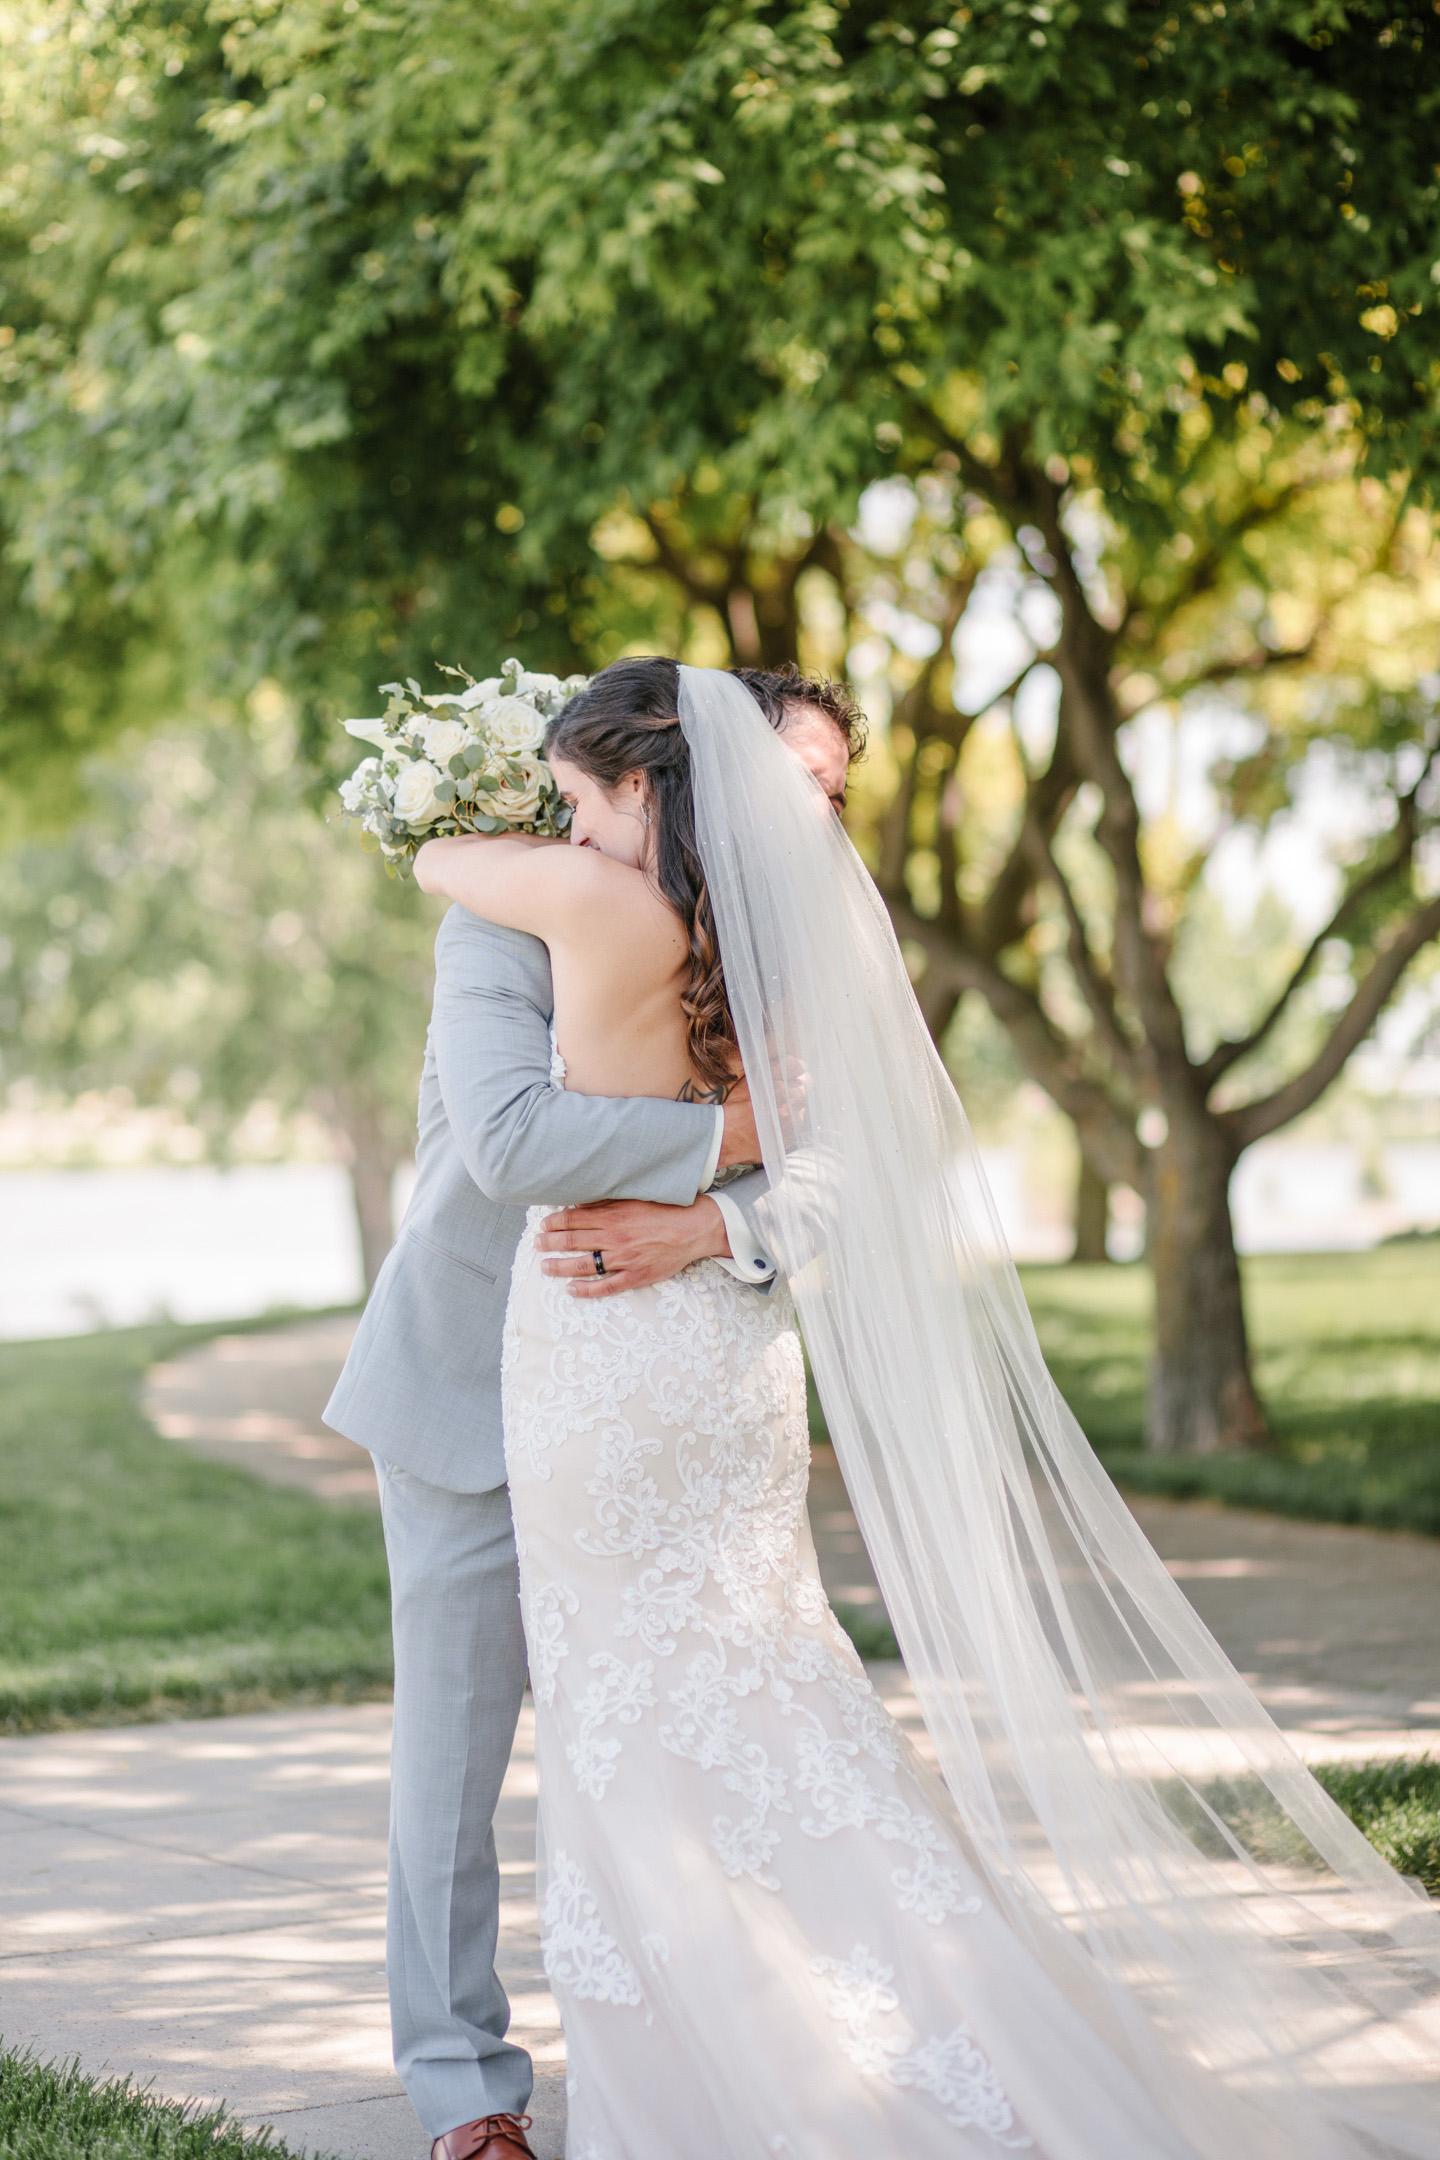 amelia-renee-photography-sioux-city-iowa-wedding-first-look-06.jpg